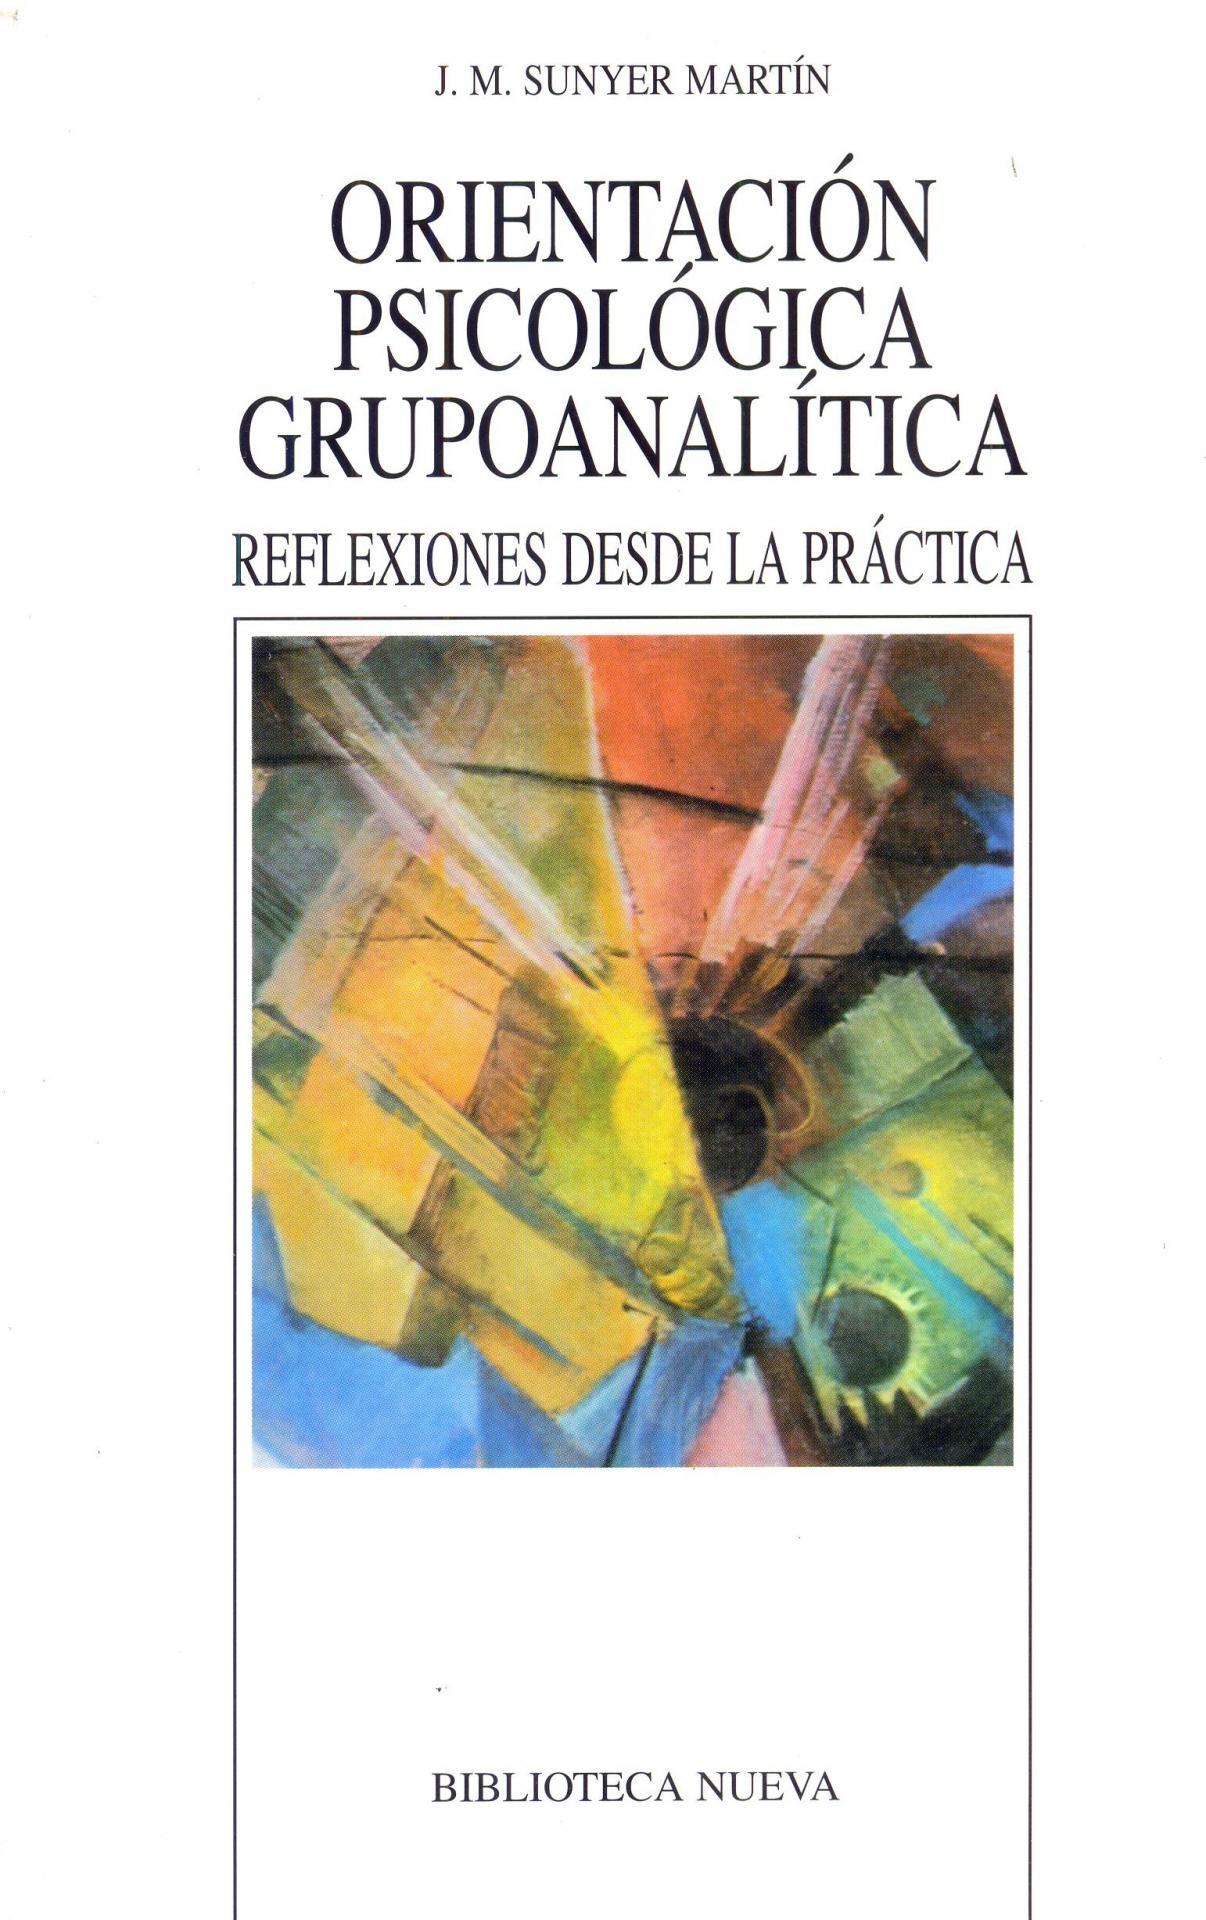 ORIENTACIÓN PSICOLÓGICA GRUPOANALÍTICA. Sunyer, JM.